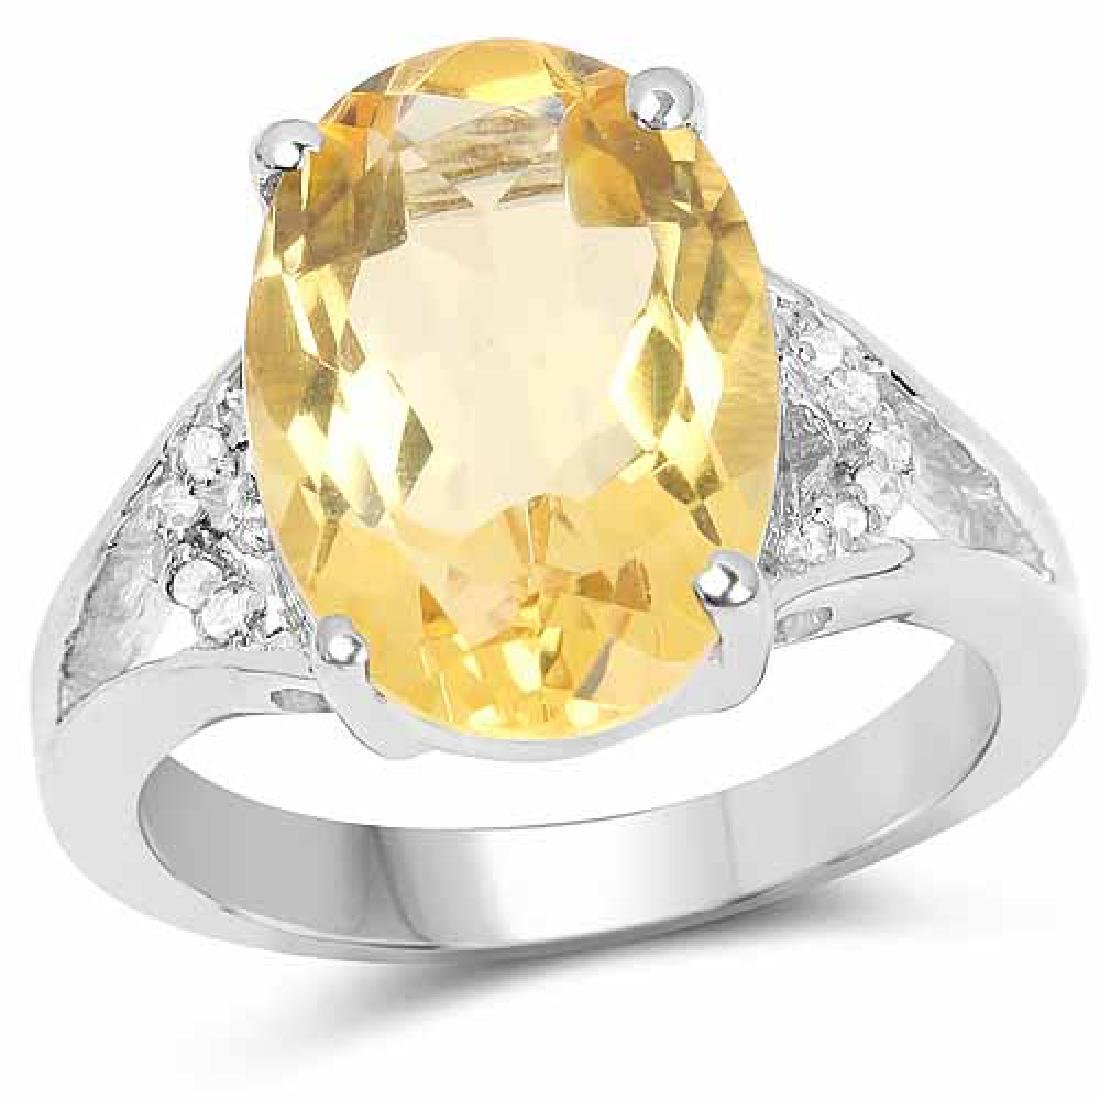 5.05 Carat Genuine Citrine and White Diamond .925 Sterl